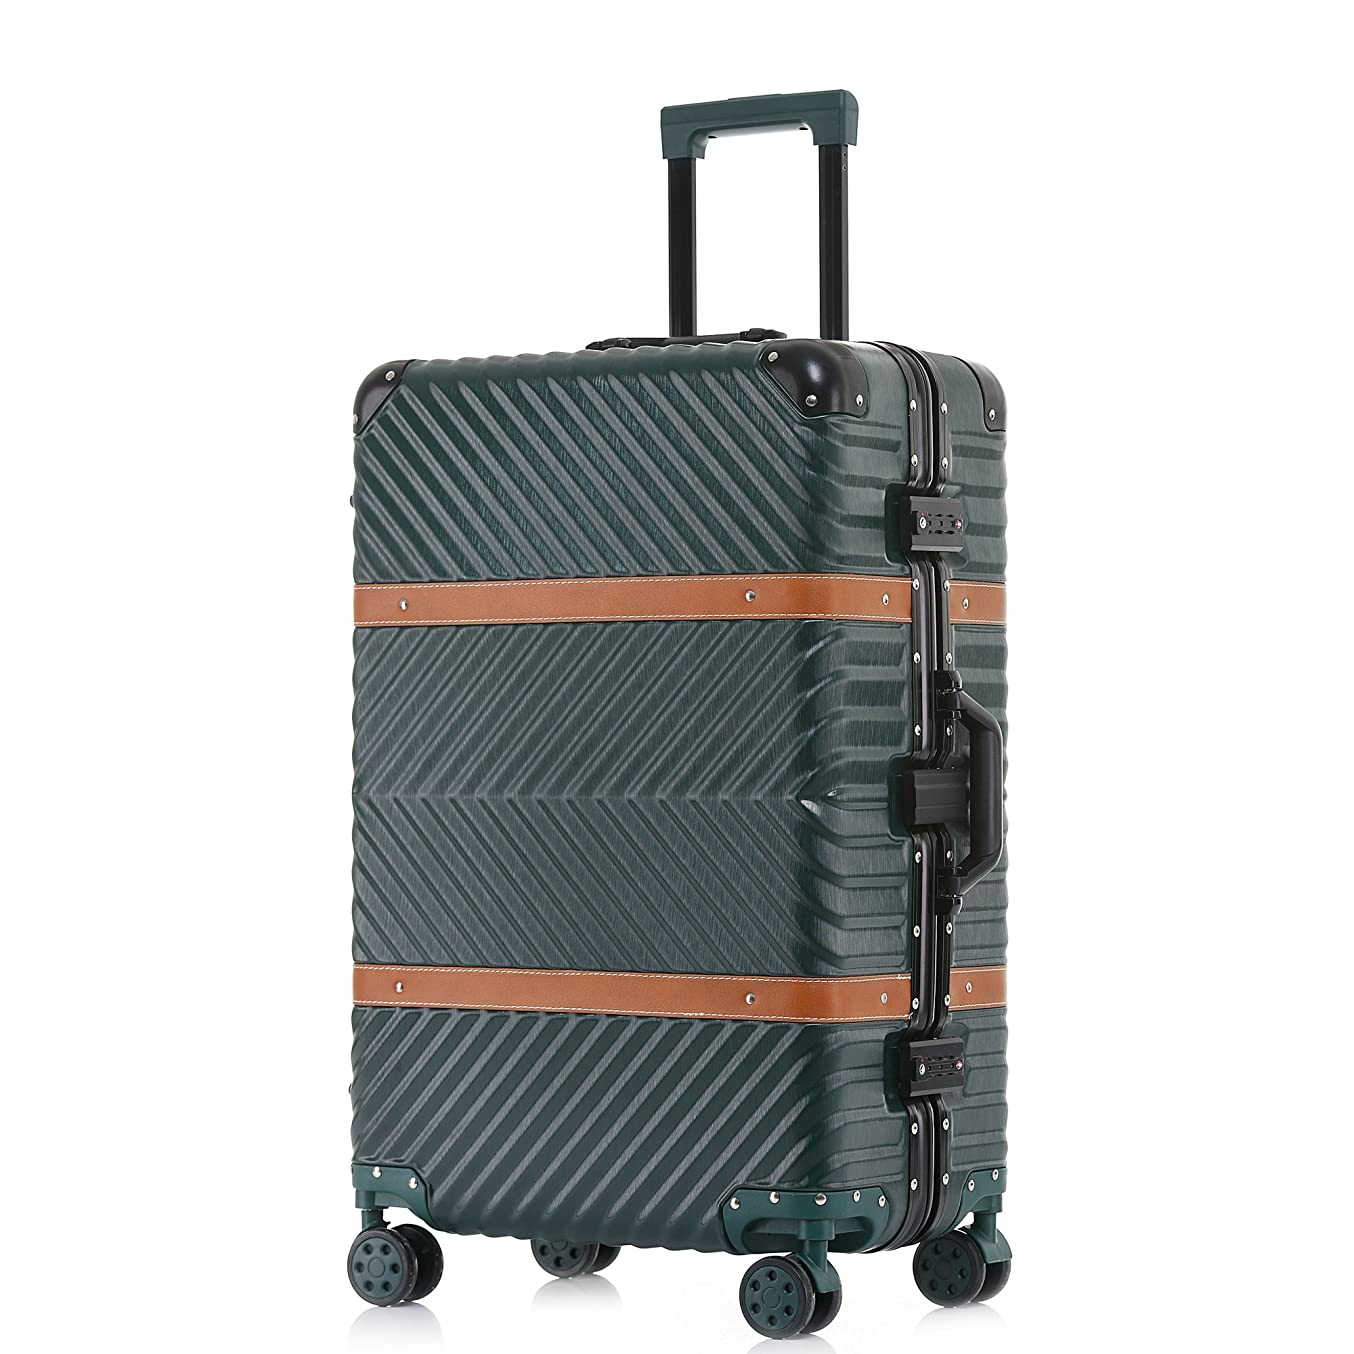 TABITORA(タビトラ) スーツケース 大型 8輪 TSAロック キャスター交換可能 ストッパー 出張 軽量 大容量 静音 旅行用品 アルミフレーム